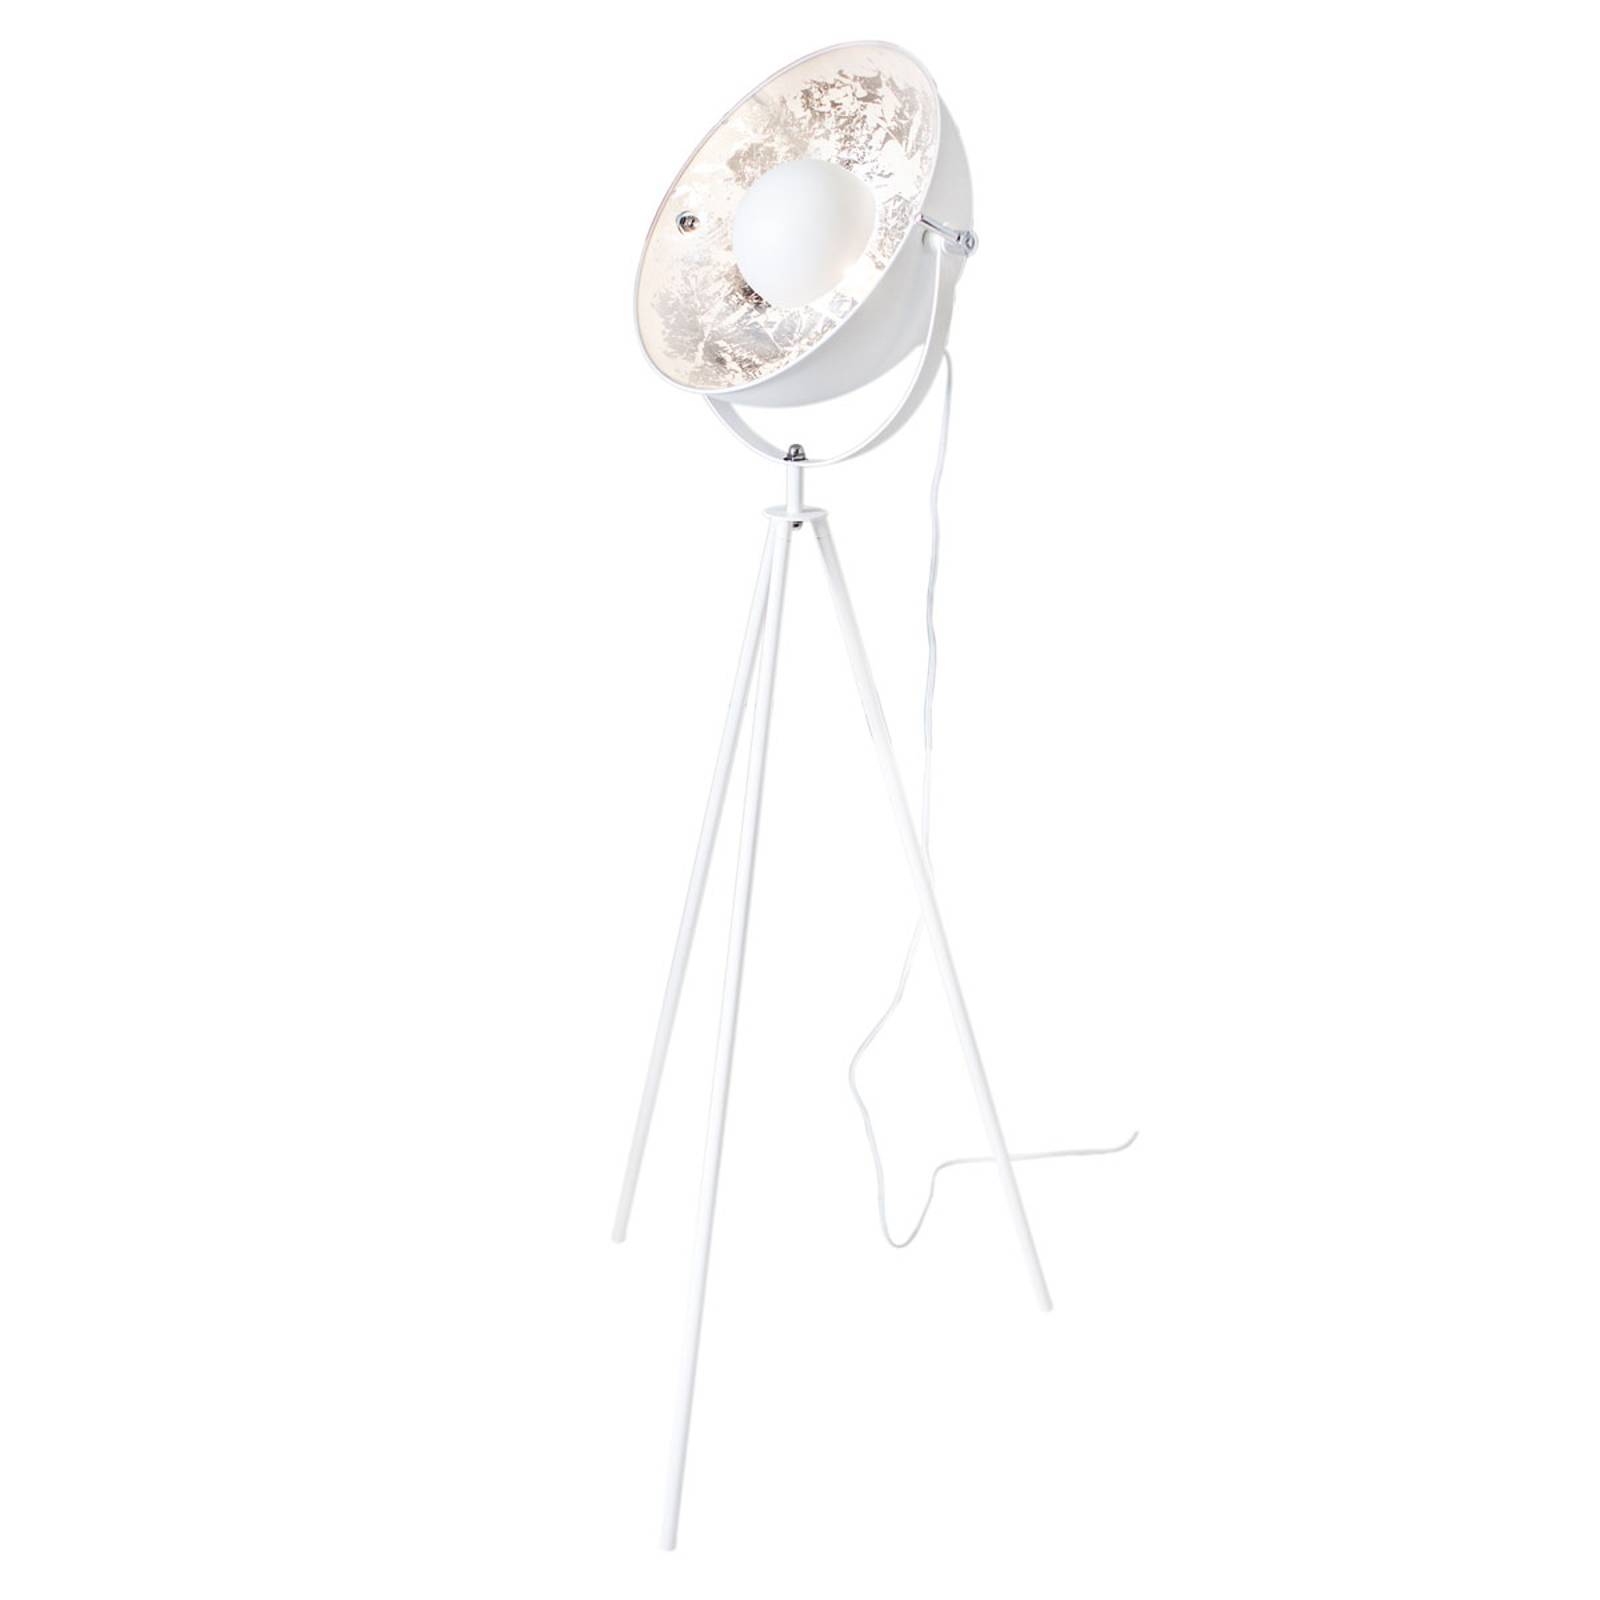 By Rydéns Captain Mini vloerlamp, wit zilver